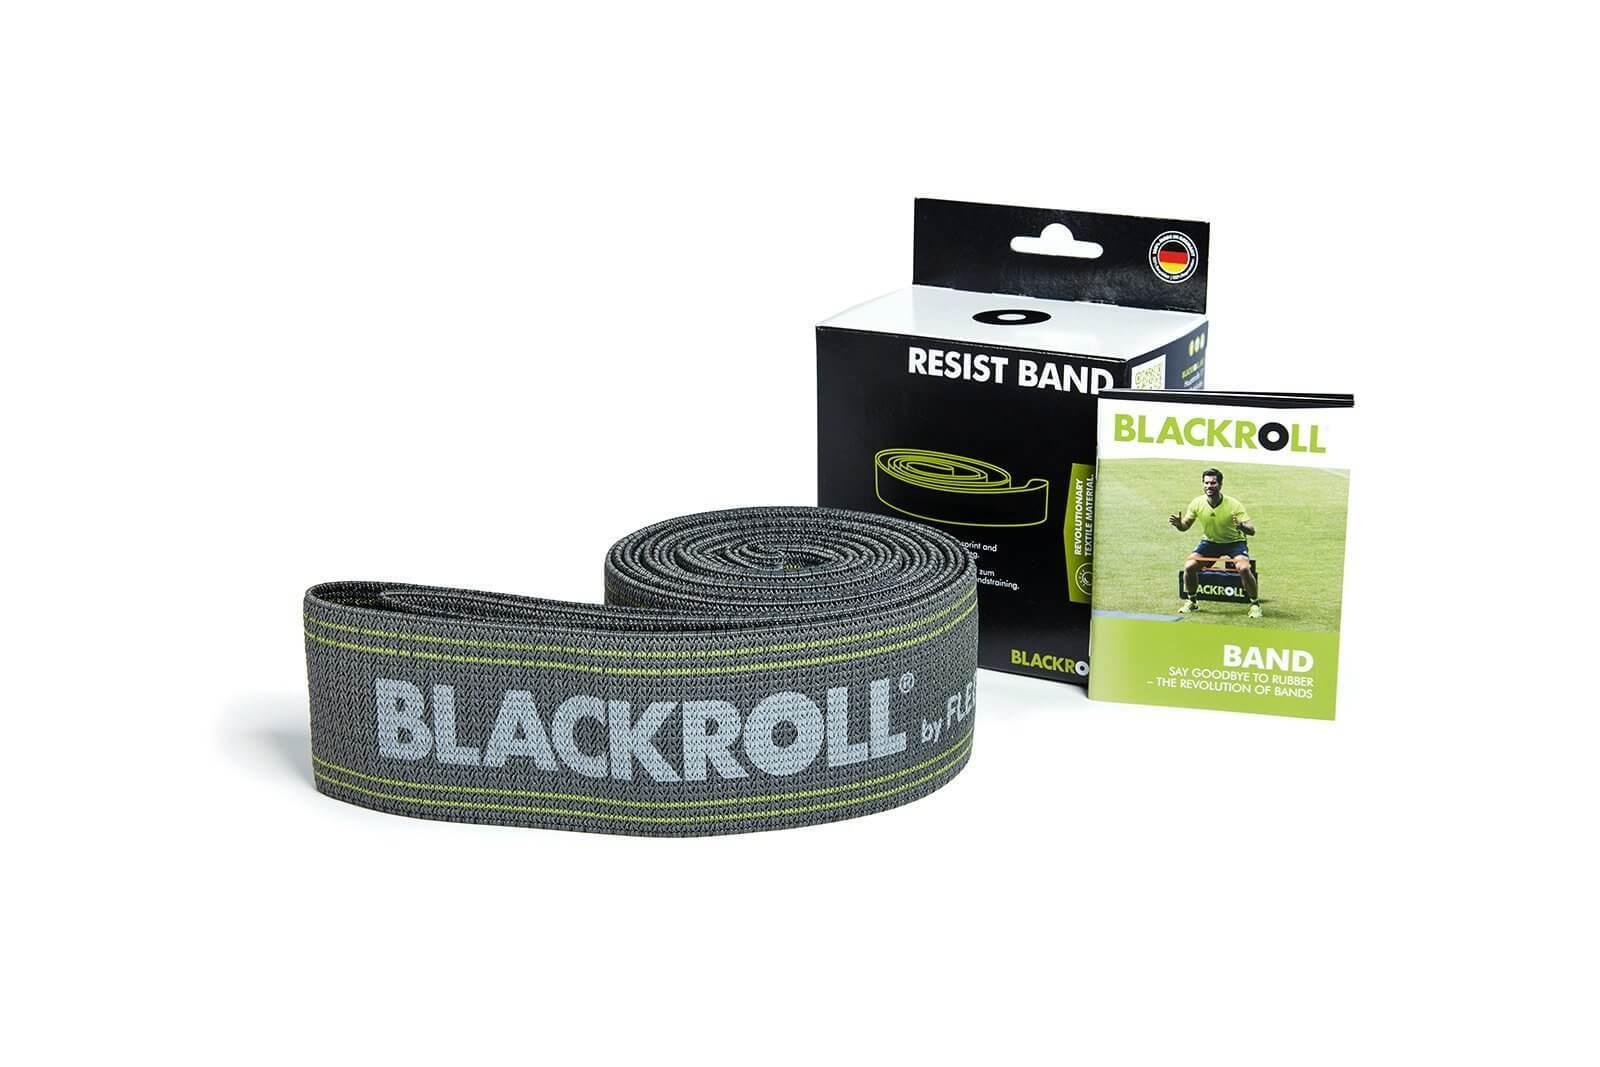 Оборудование BLACKROLL® для тренинга Эспандер-лента текстильная BLACKROLL® RESIST BAND 190 см (тяжелое сопротивление, серая) BLACKROLL_white_small_0088_Sebastian_Schoffel_4b323ae4-8878-41b0-9704-1d808522345d.jpg